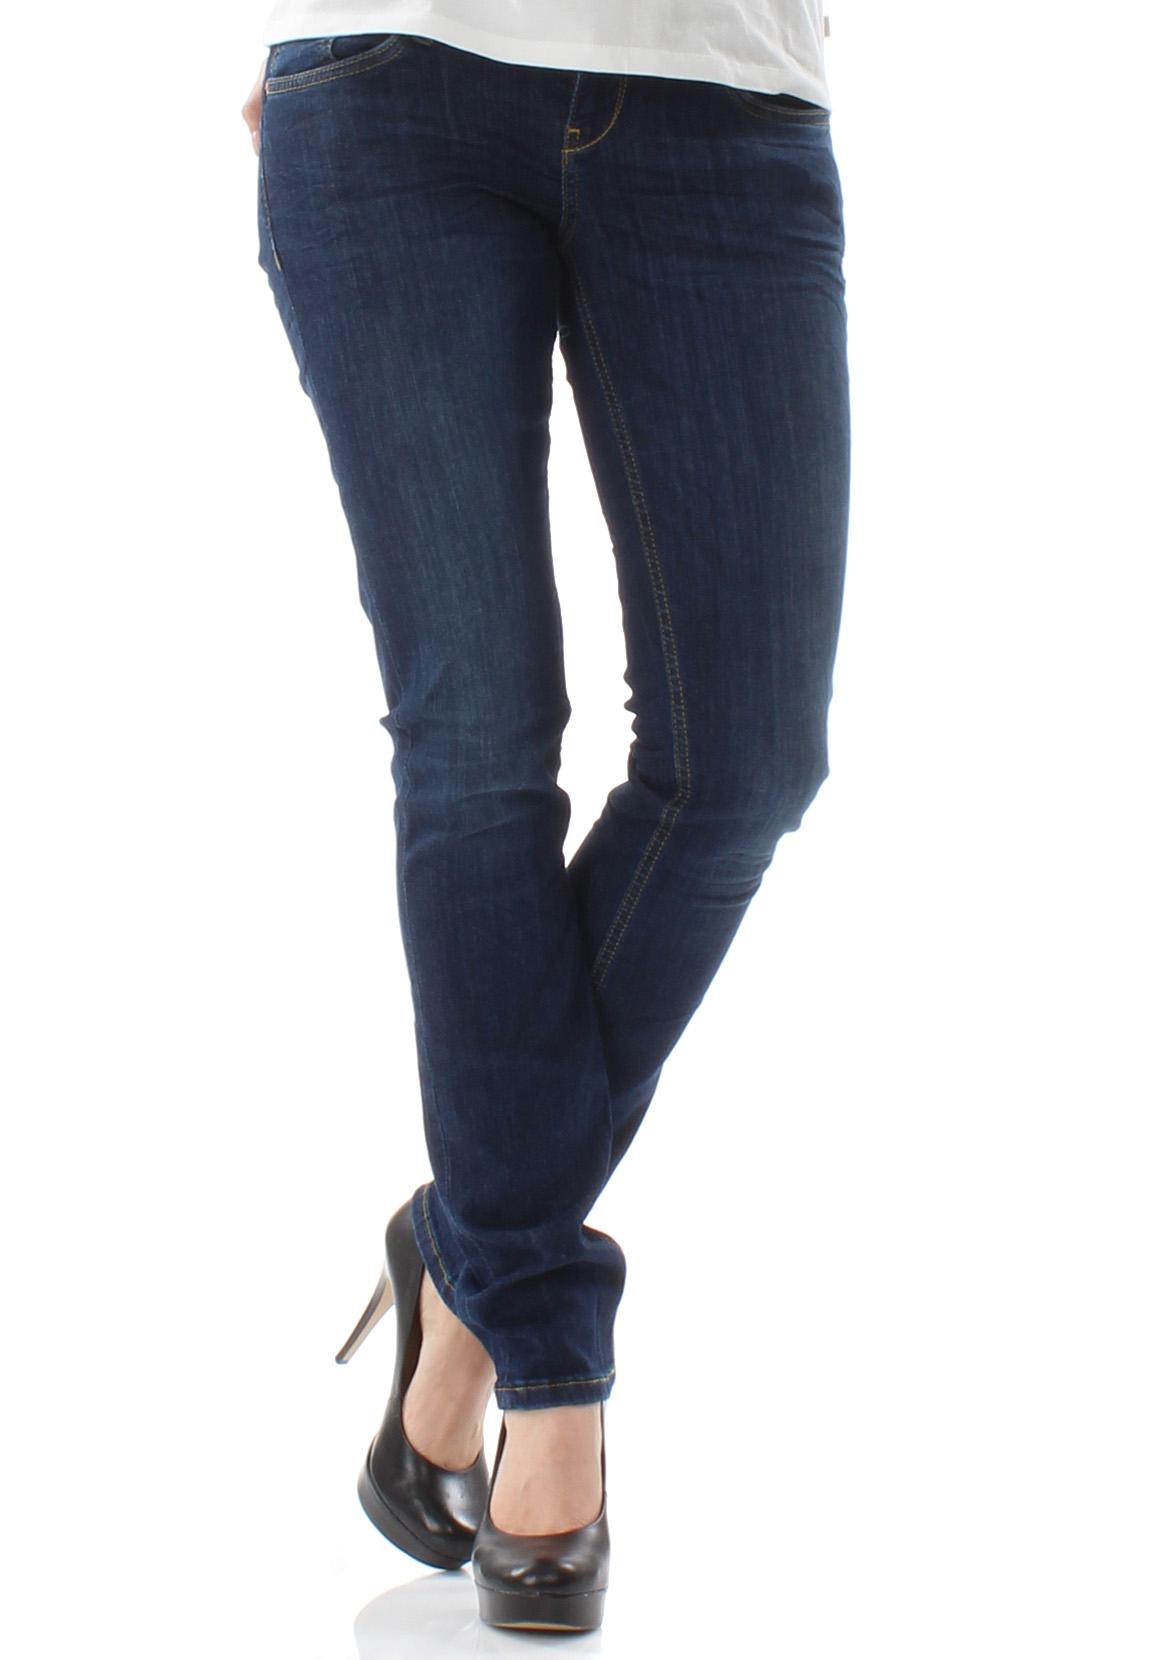 ltb jeans damen aspen meryl wash dunkelblau damen jeans. Black Bedroom Furniture Sets. Home Design Ideas